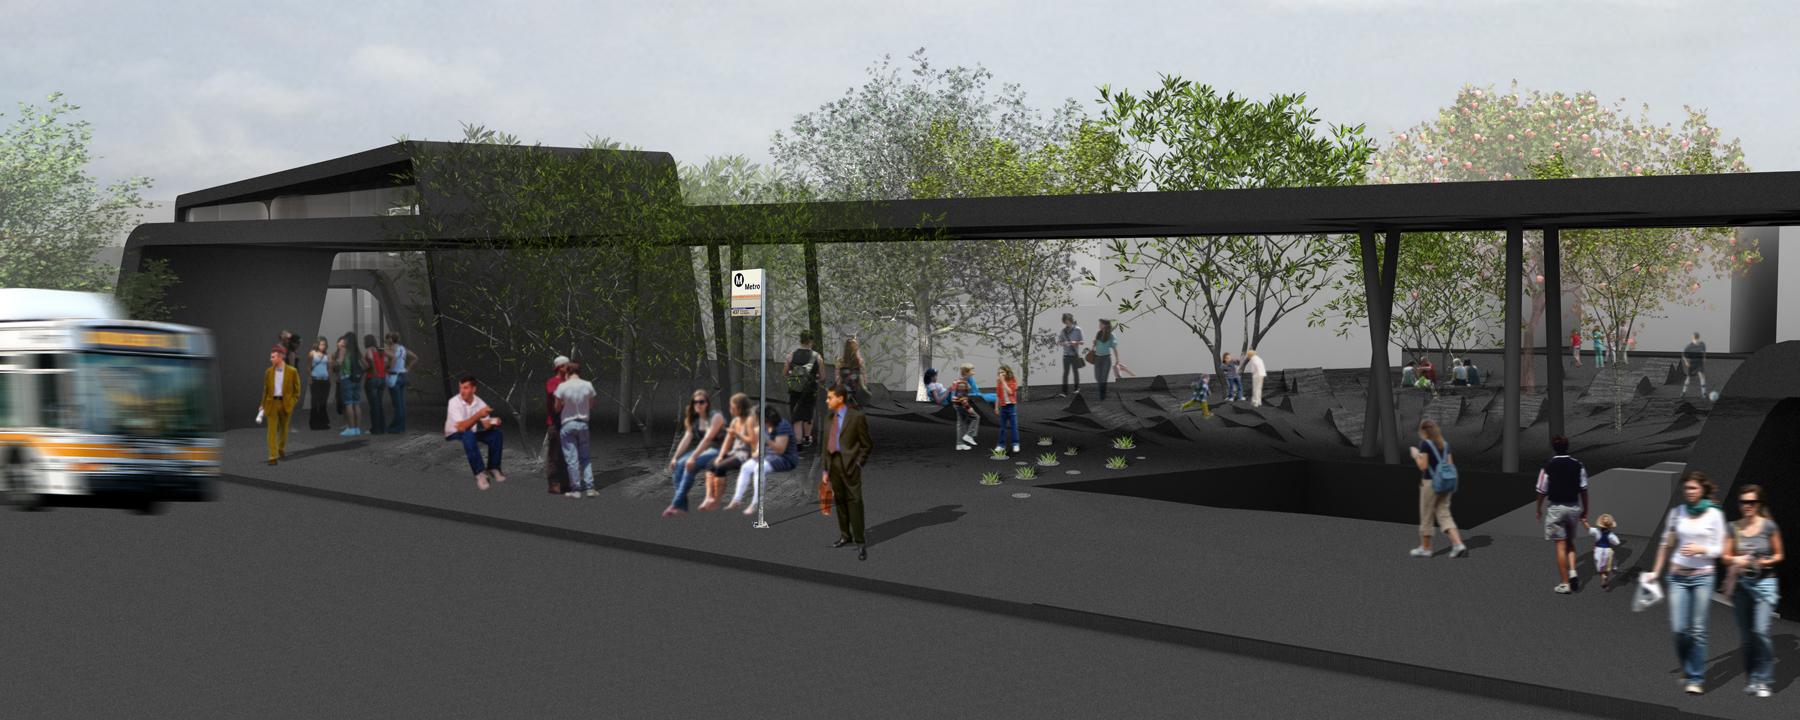 asphalt-urbanscape-render4.jpg